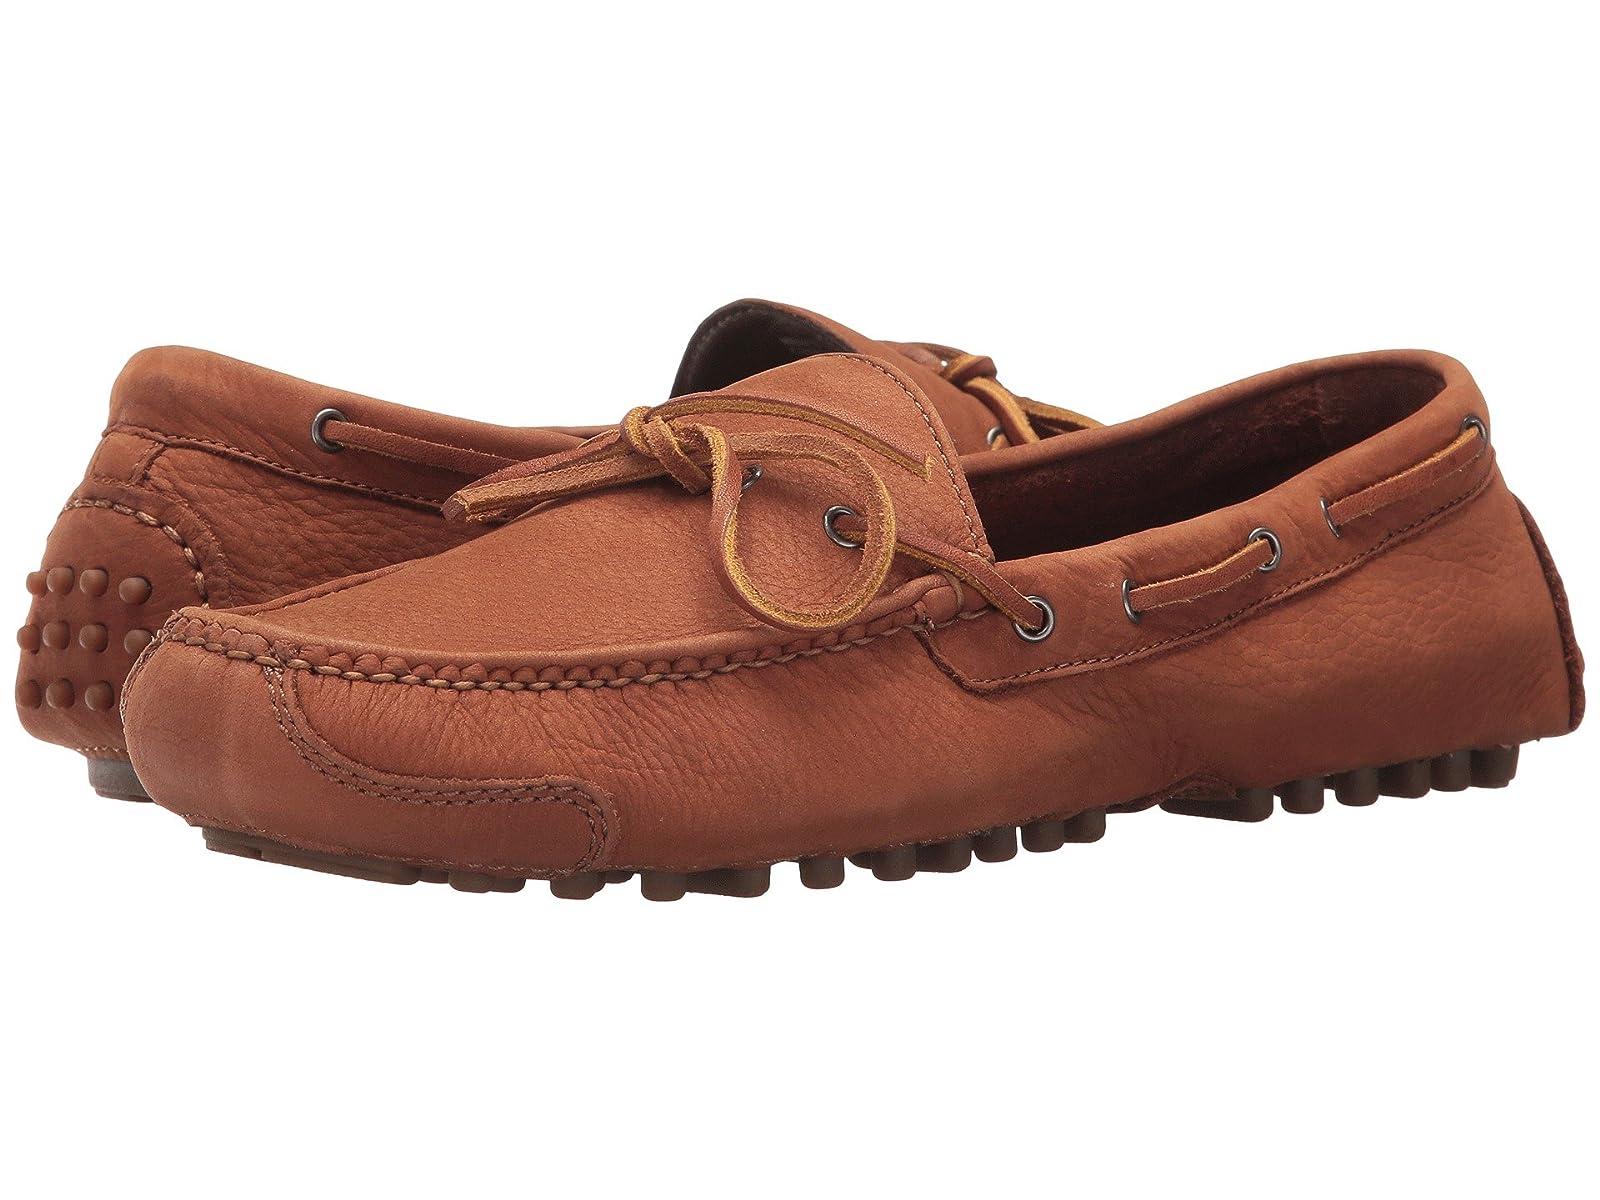 Cole Haan Gunnison IICheap and distinctive eye-catching shoes